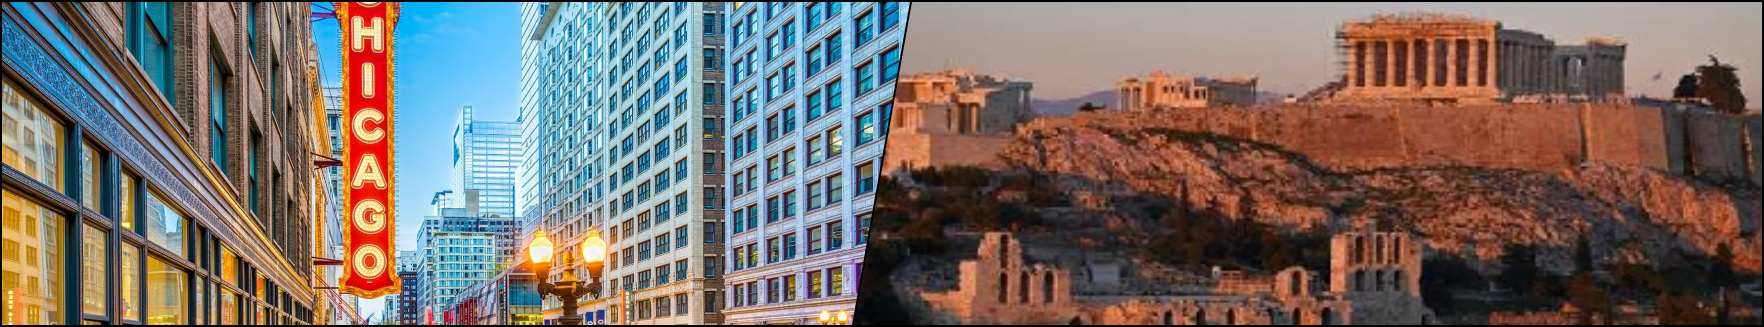 Chicago - Athens